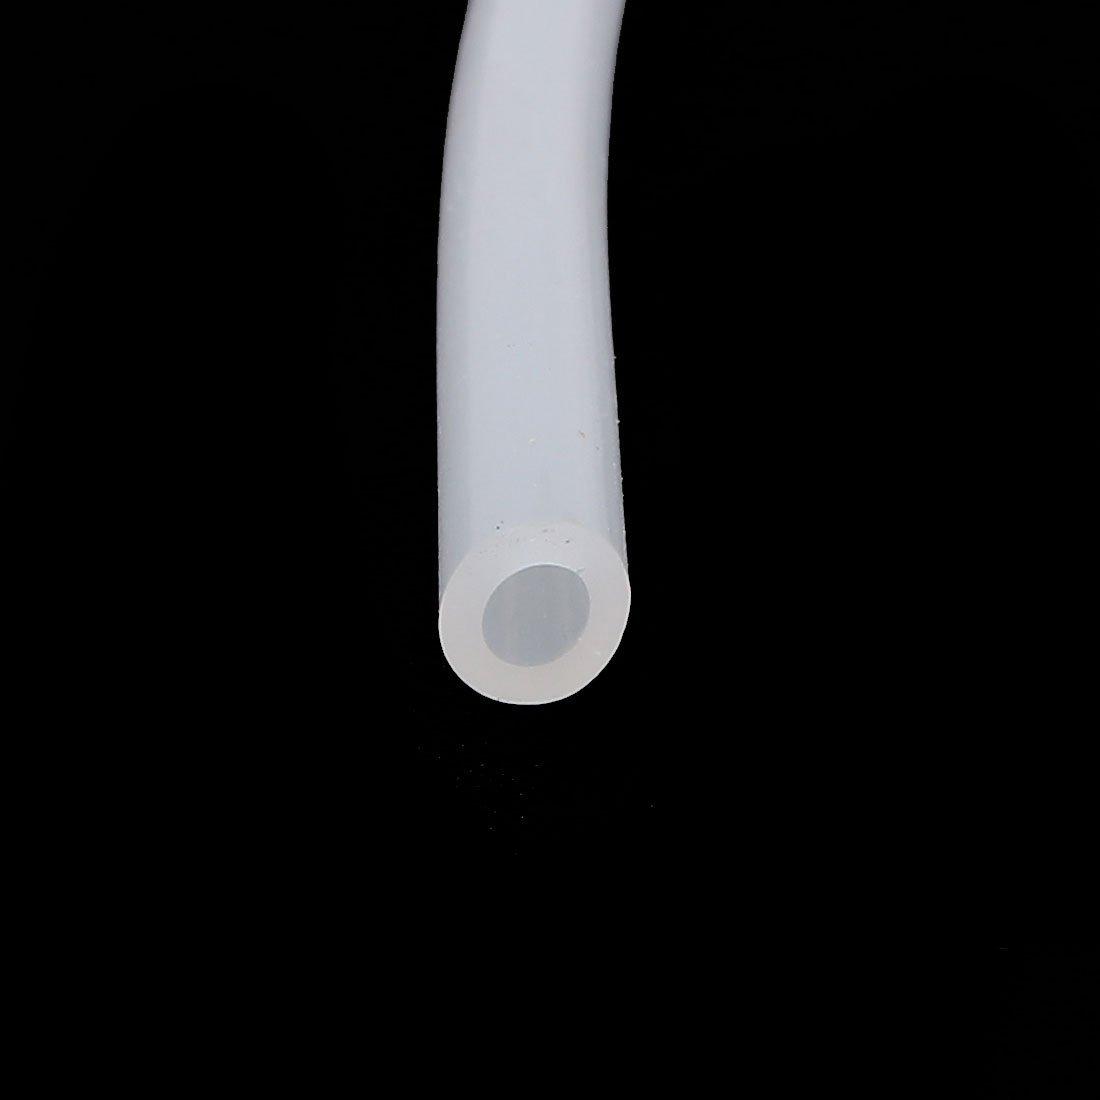 DealMux 3 milímetros x 5 mm Food Grade Beige silicone Tubo de Água Air Bomba Hose Pipe 5M: Amazon.com: Industrial & Scientific